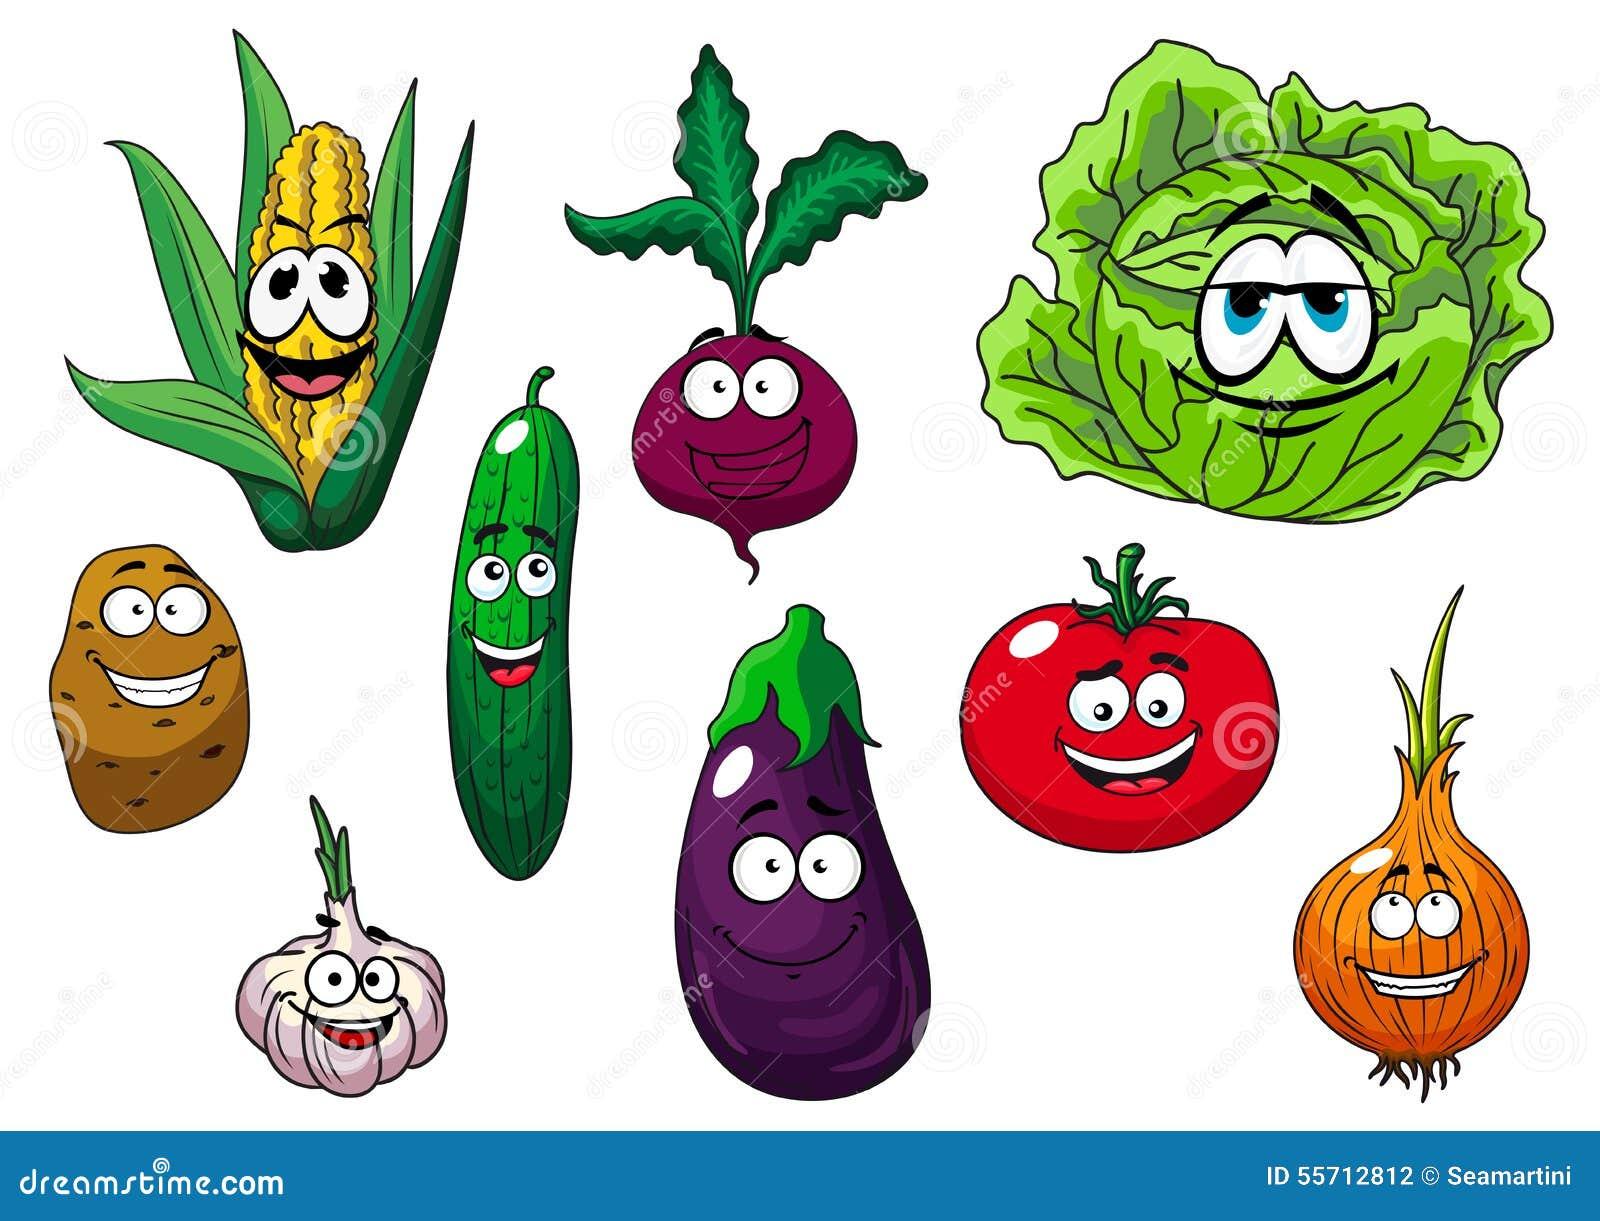 fresh tasty cartoon vegetables characters stock vector corn on the cob clip art outline corn on the cob clip art funny